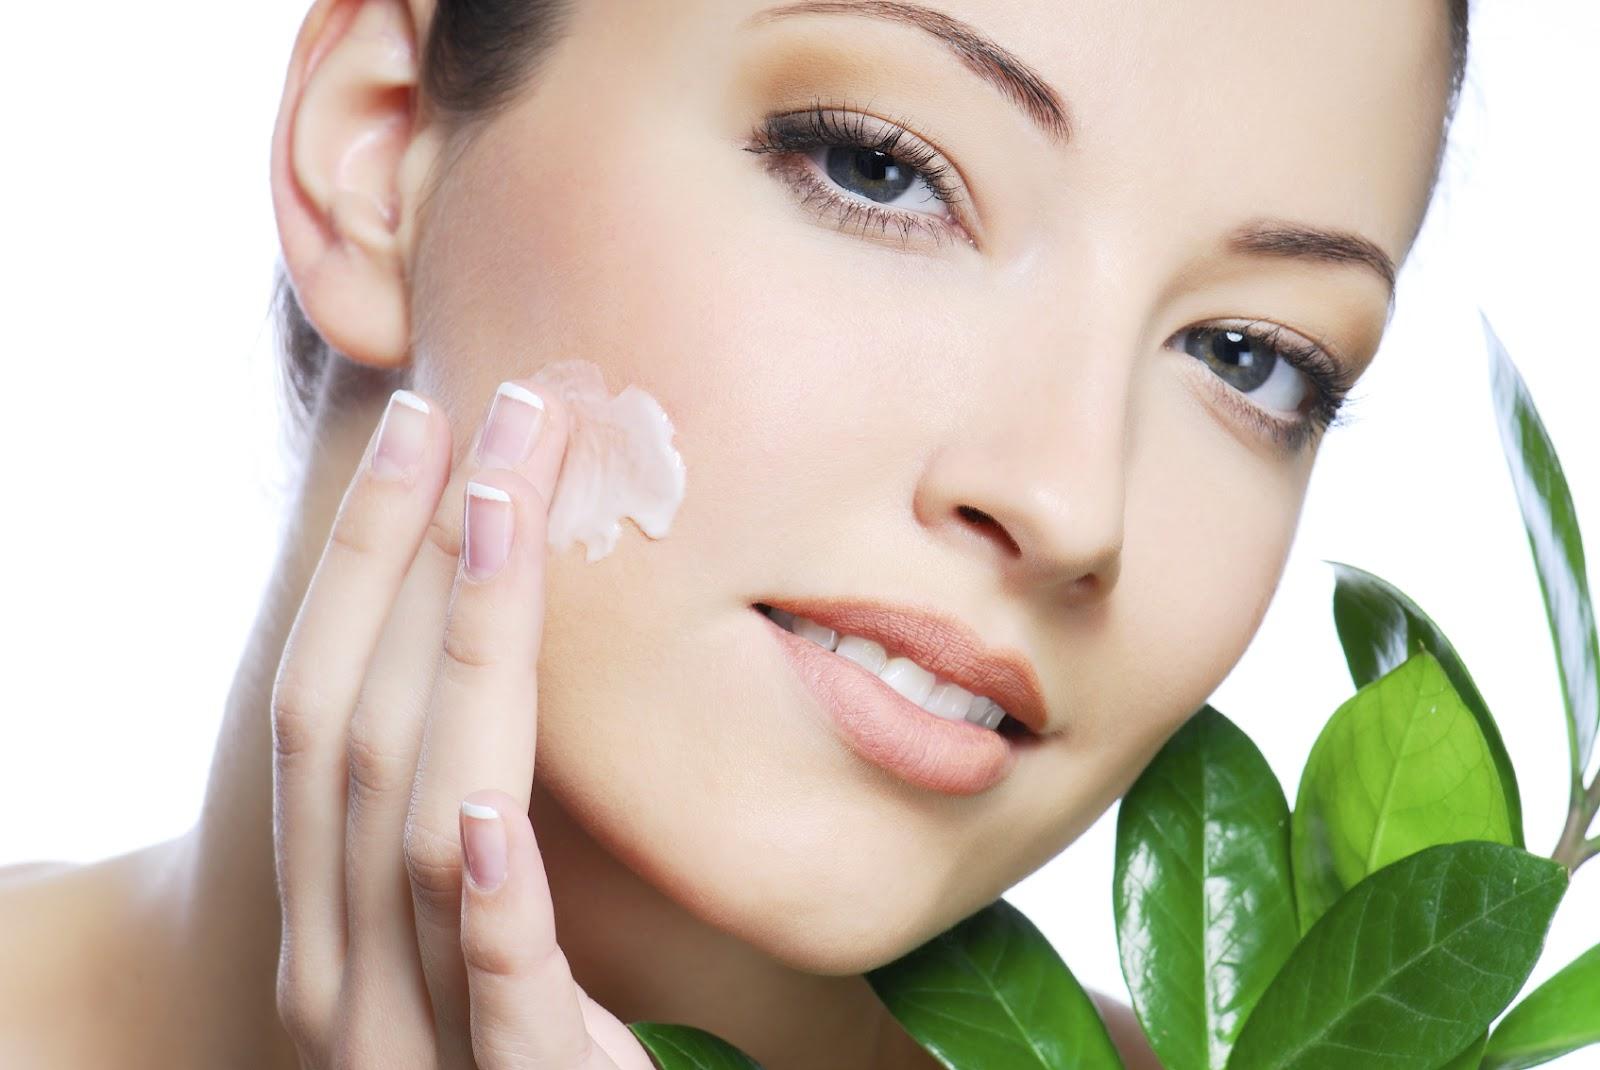 Get The Best Vitiligo Treatment In Entire Delhi Today